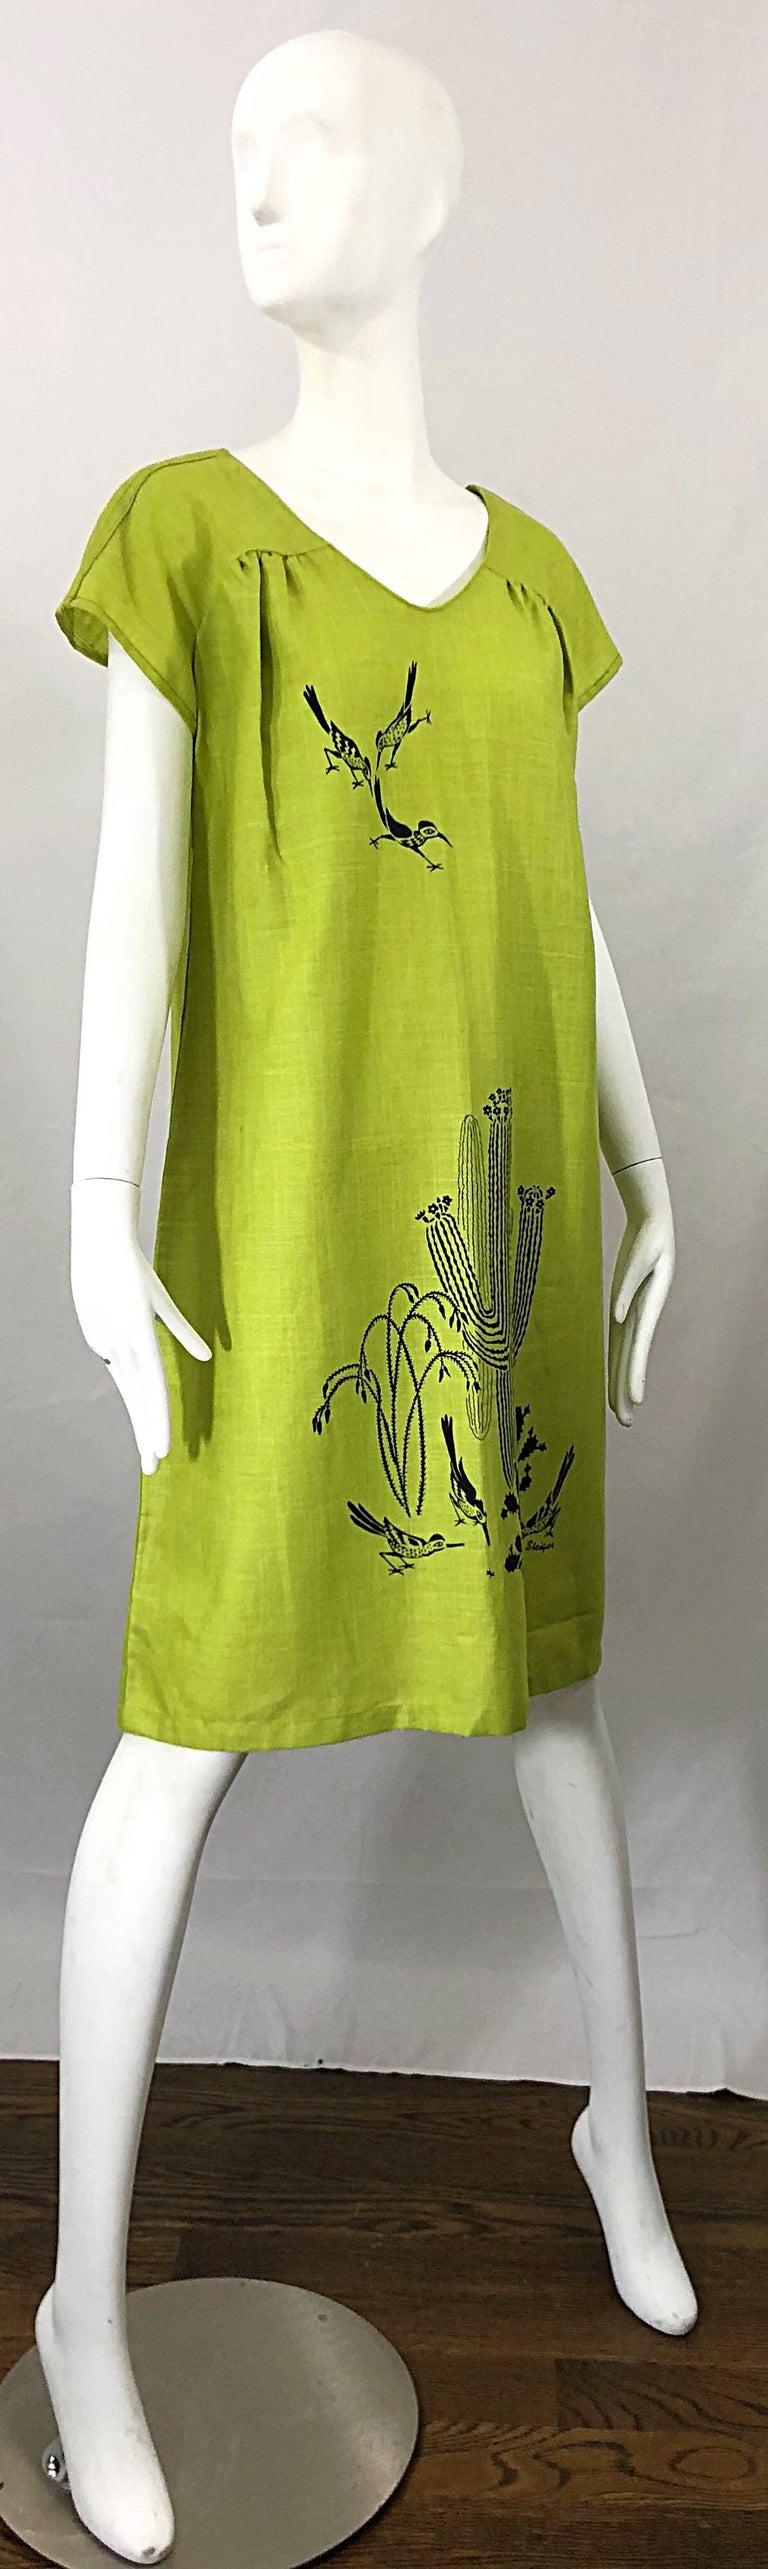 Rare 1970s Harwood Steiger Screen Printed Ant Eater Novelty Linen Tunic Dress For Sale 4